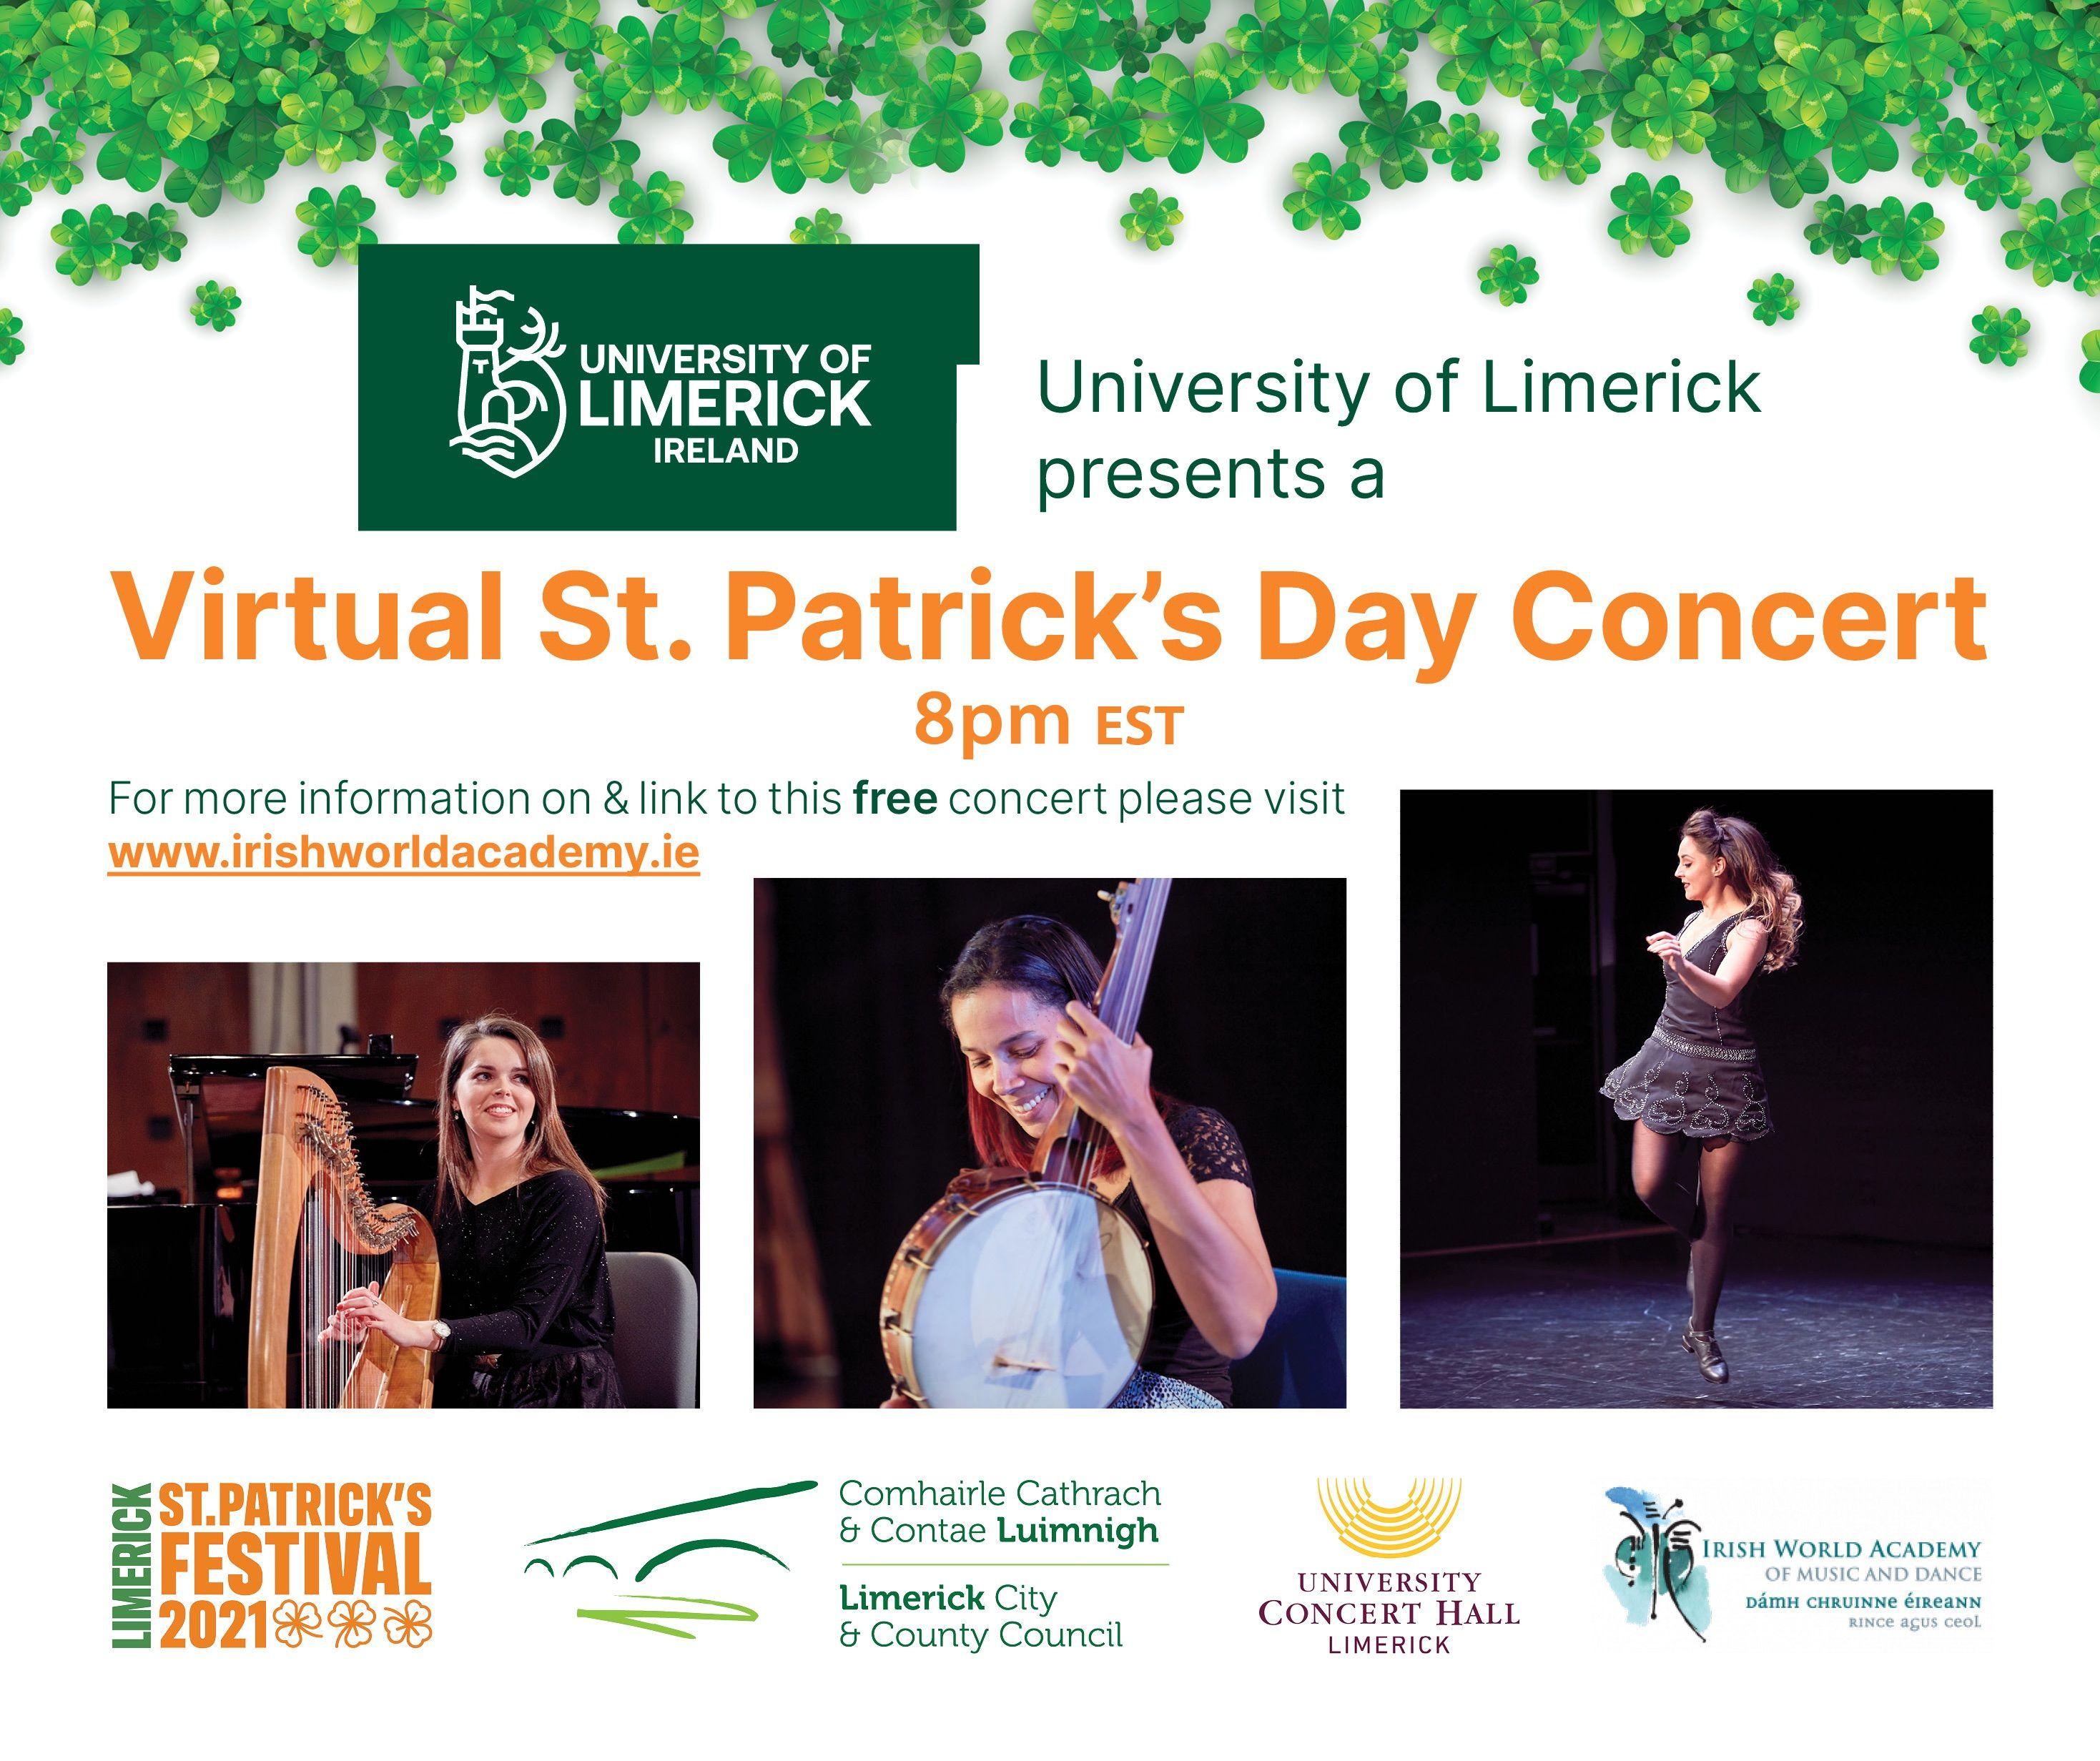 The University of Limerick Irish World Academy of Music & Dance presents the virtual St. Patrick's Day Concert.